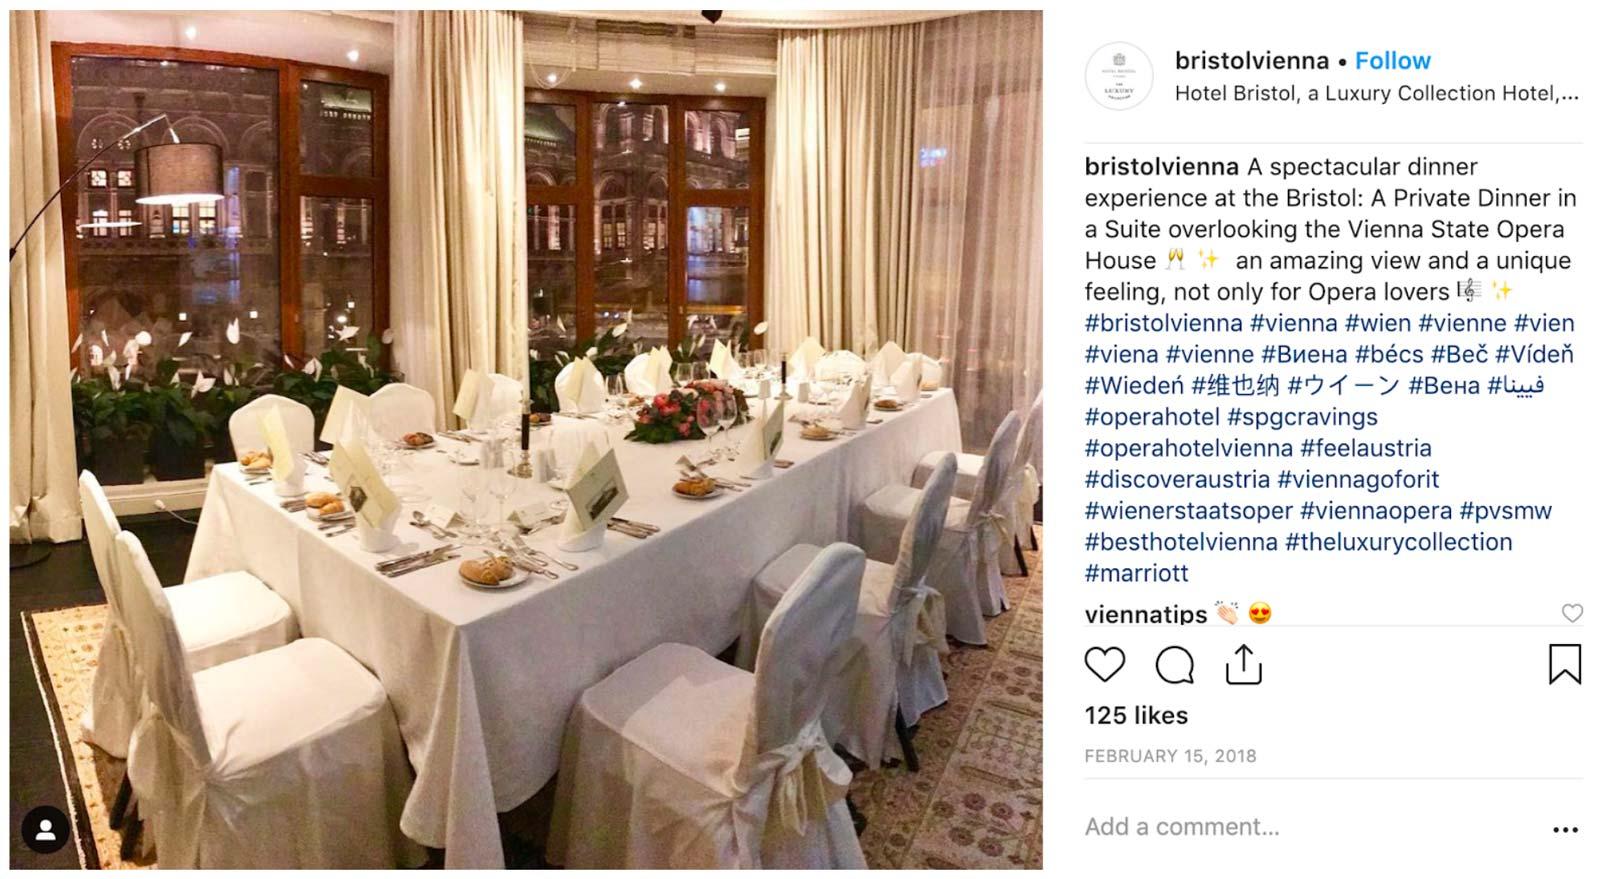 Hotel Bristol Vienna, Prestigious Venues Social Media Week, 9